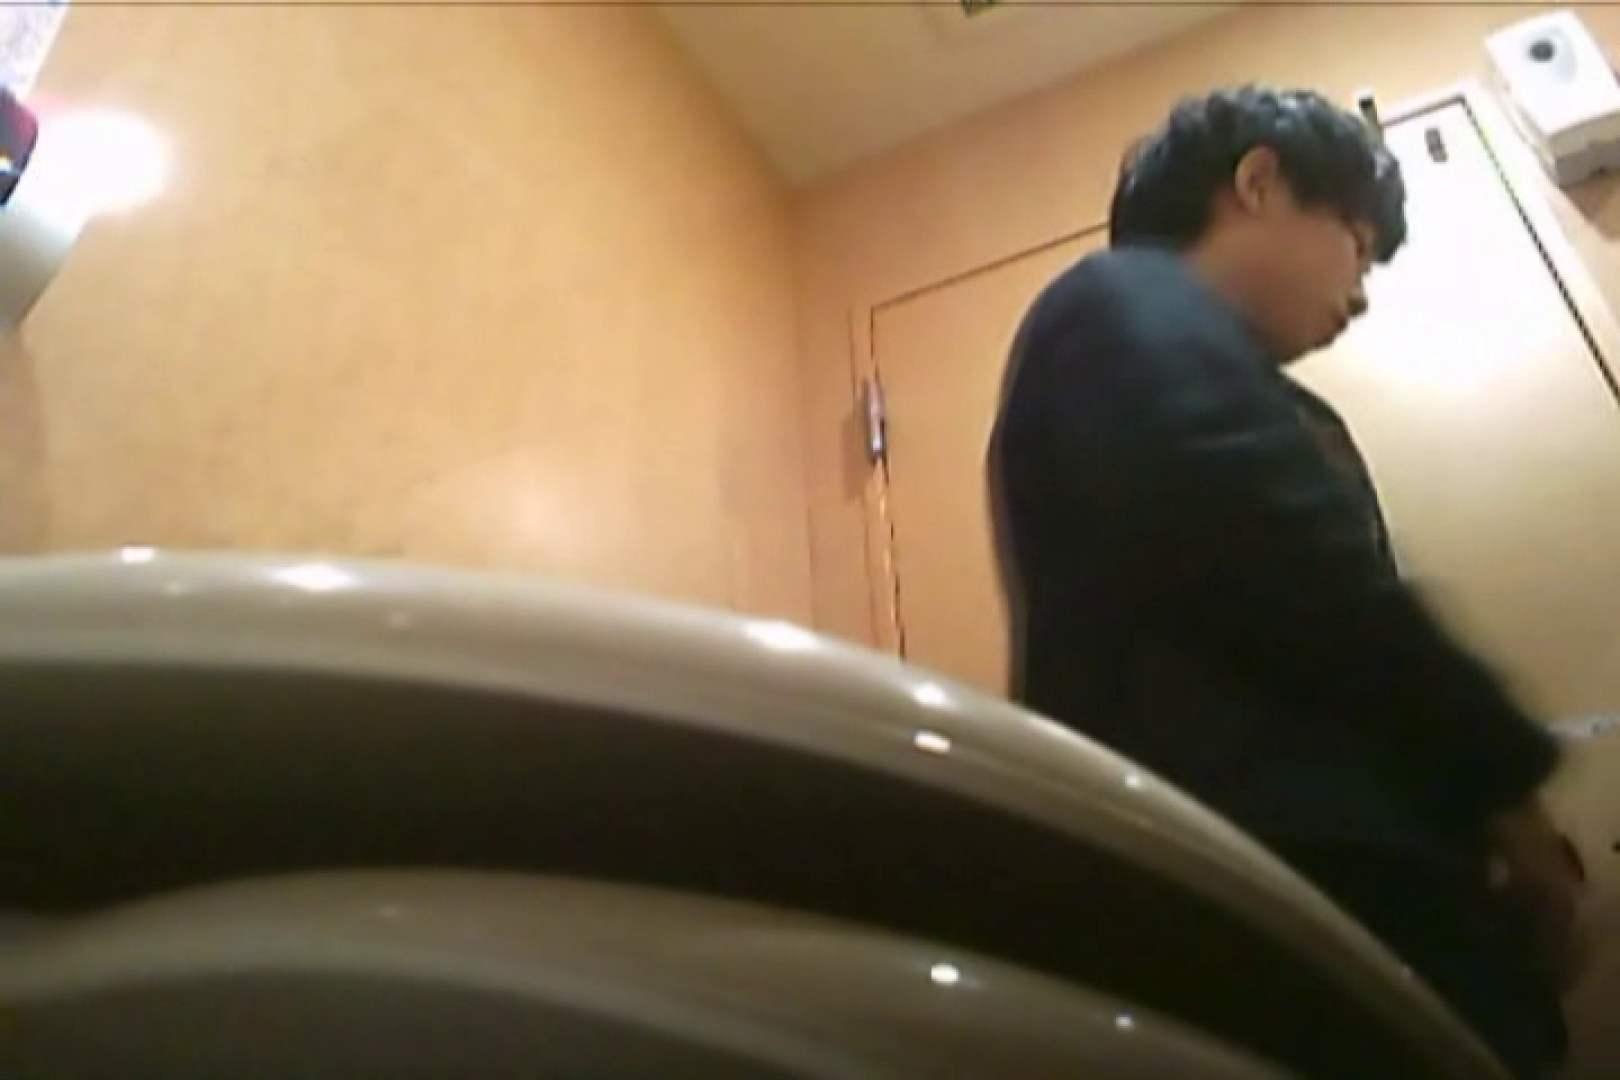 Gボーイ初投稿!掴み取りさんの洗面所覗き!in新幹線!VOL.18 丸見え  80pic 24